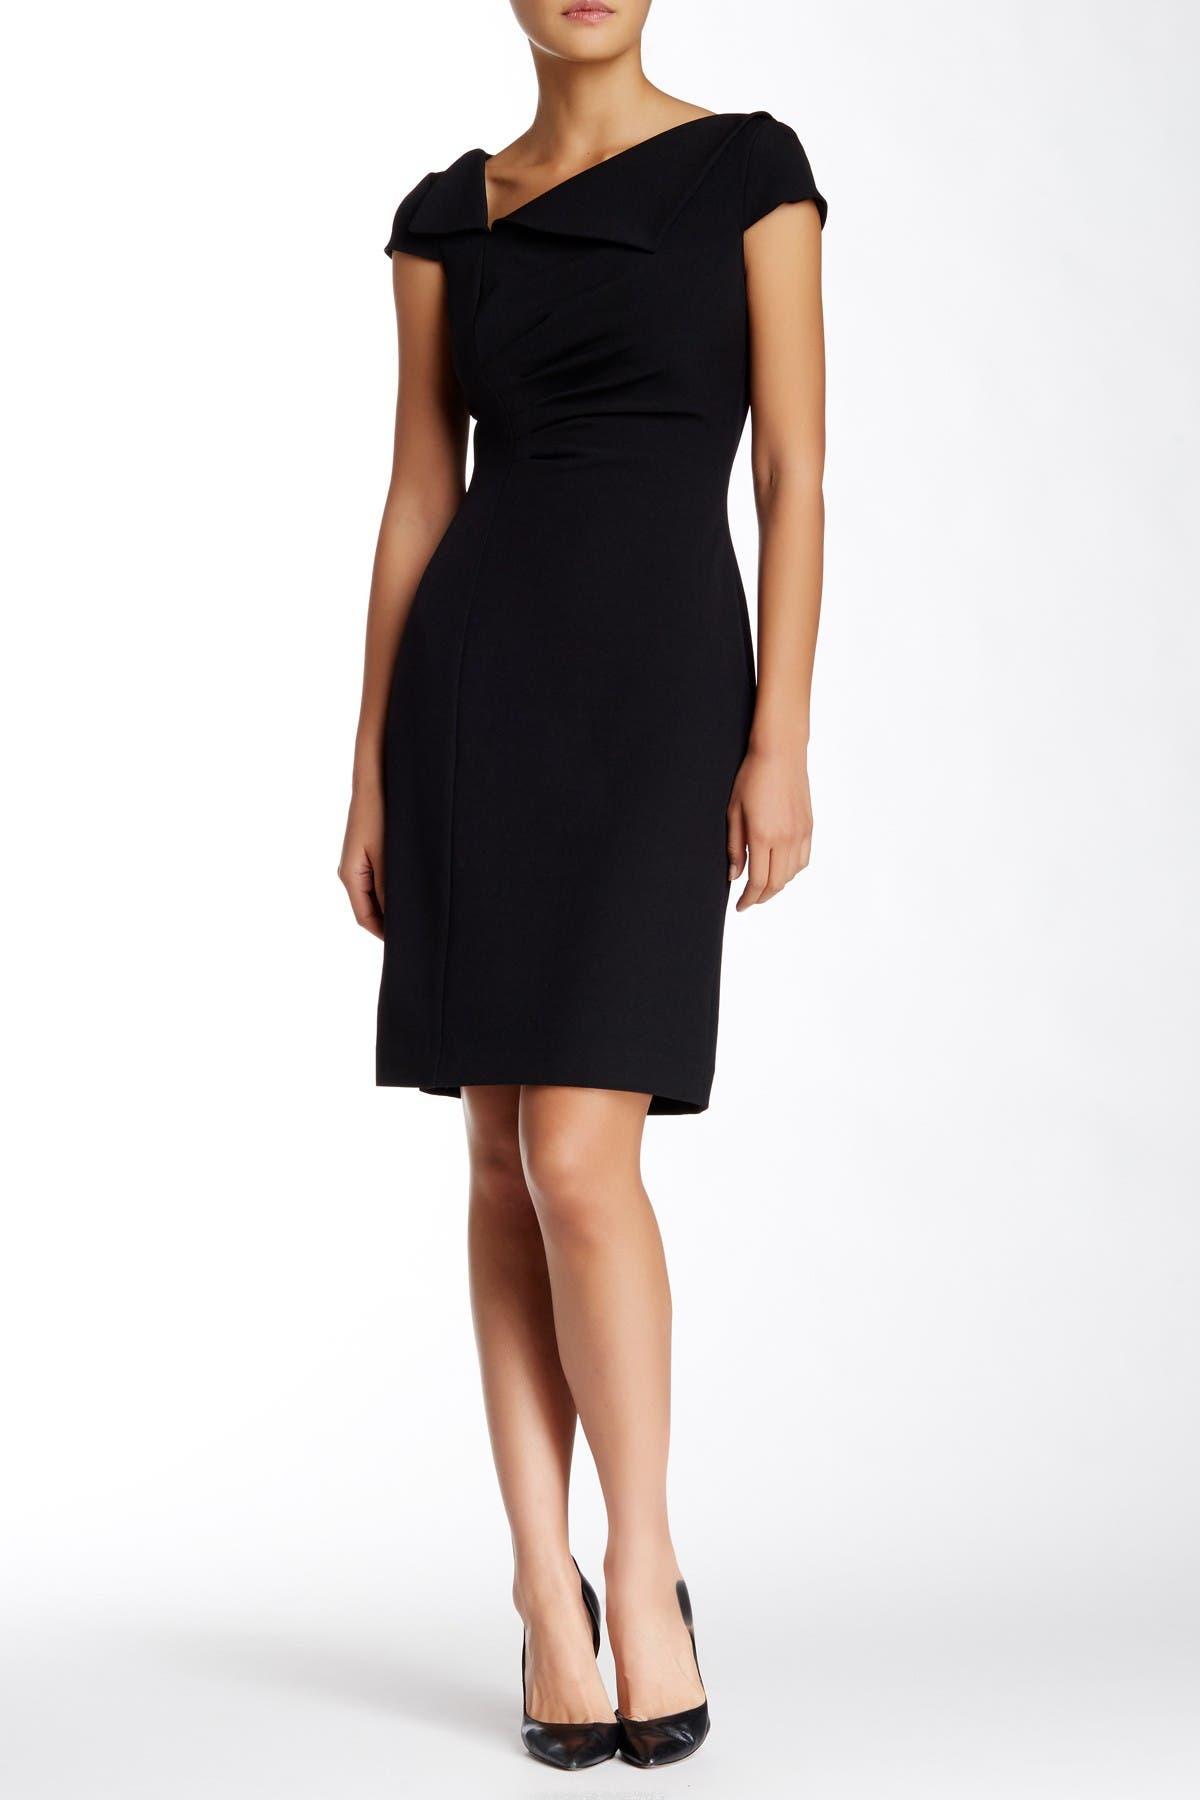 Image of Tahari Foldover Neck Sheath Dress